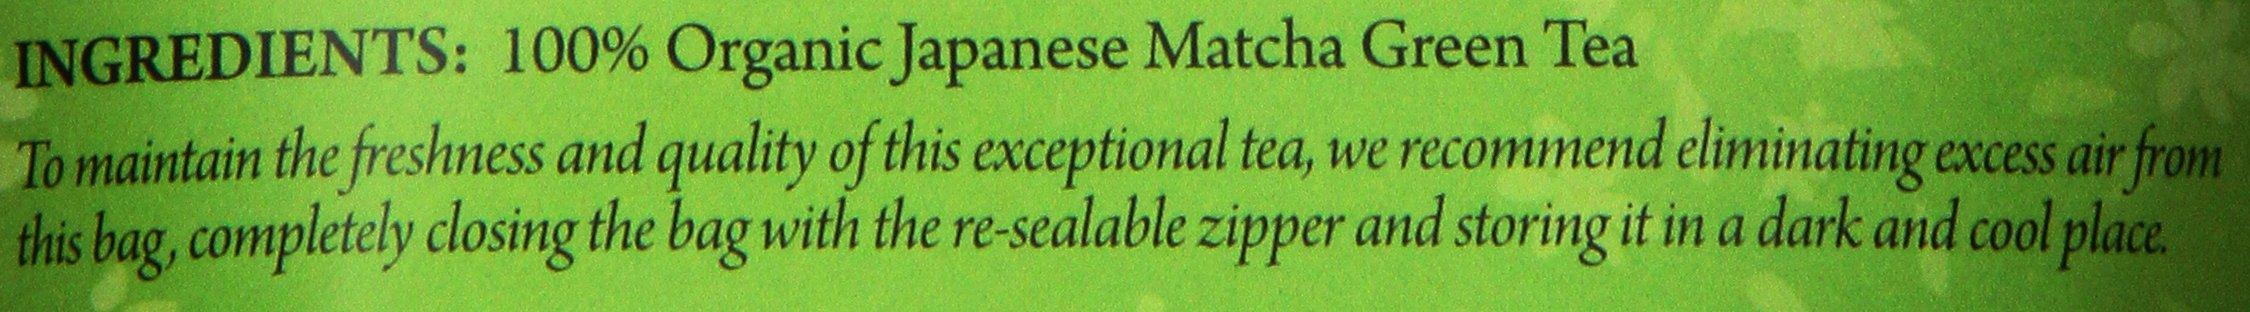 TASTE OF KYOTO Matcha Green Tea, Bulk Reserve, 8.80 Ounce by Taste of Kyoto (Image #2)